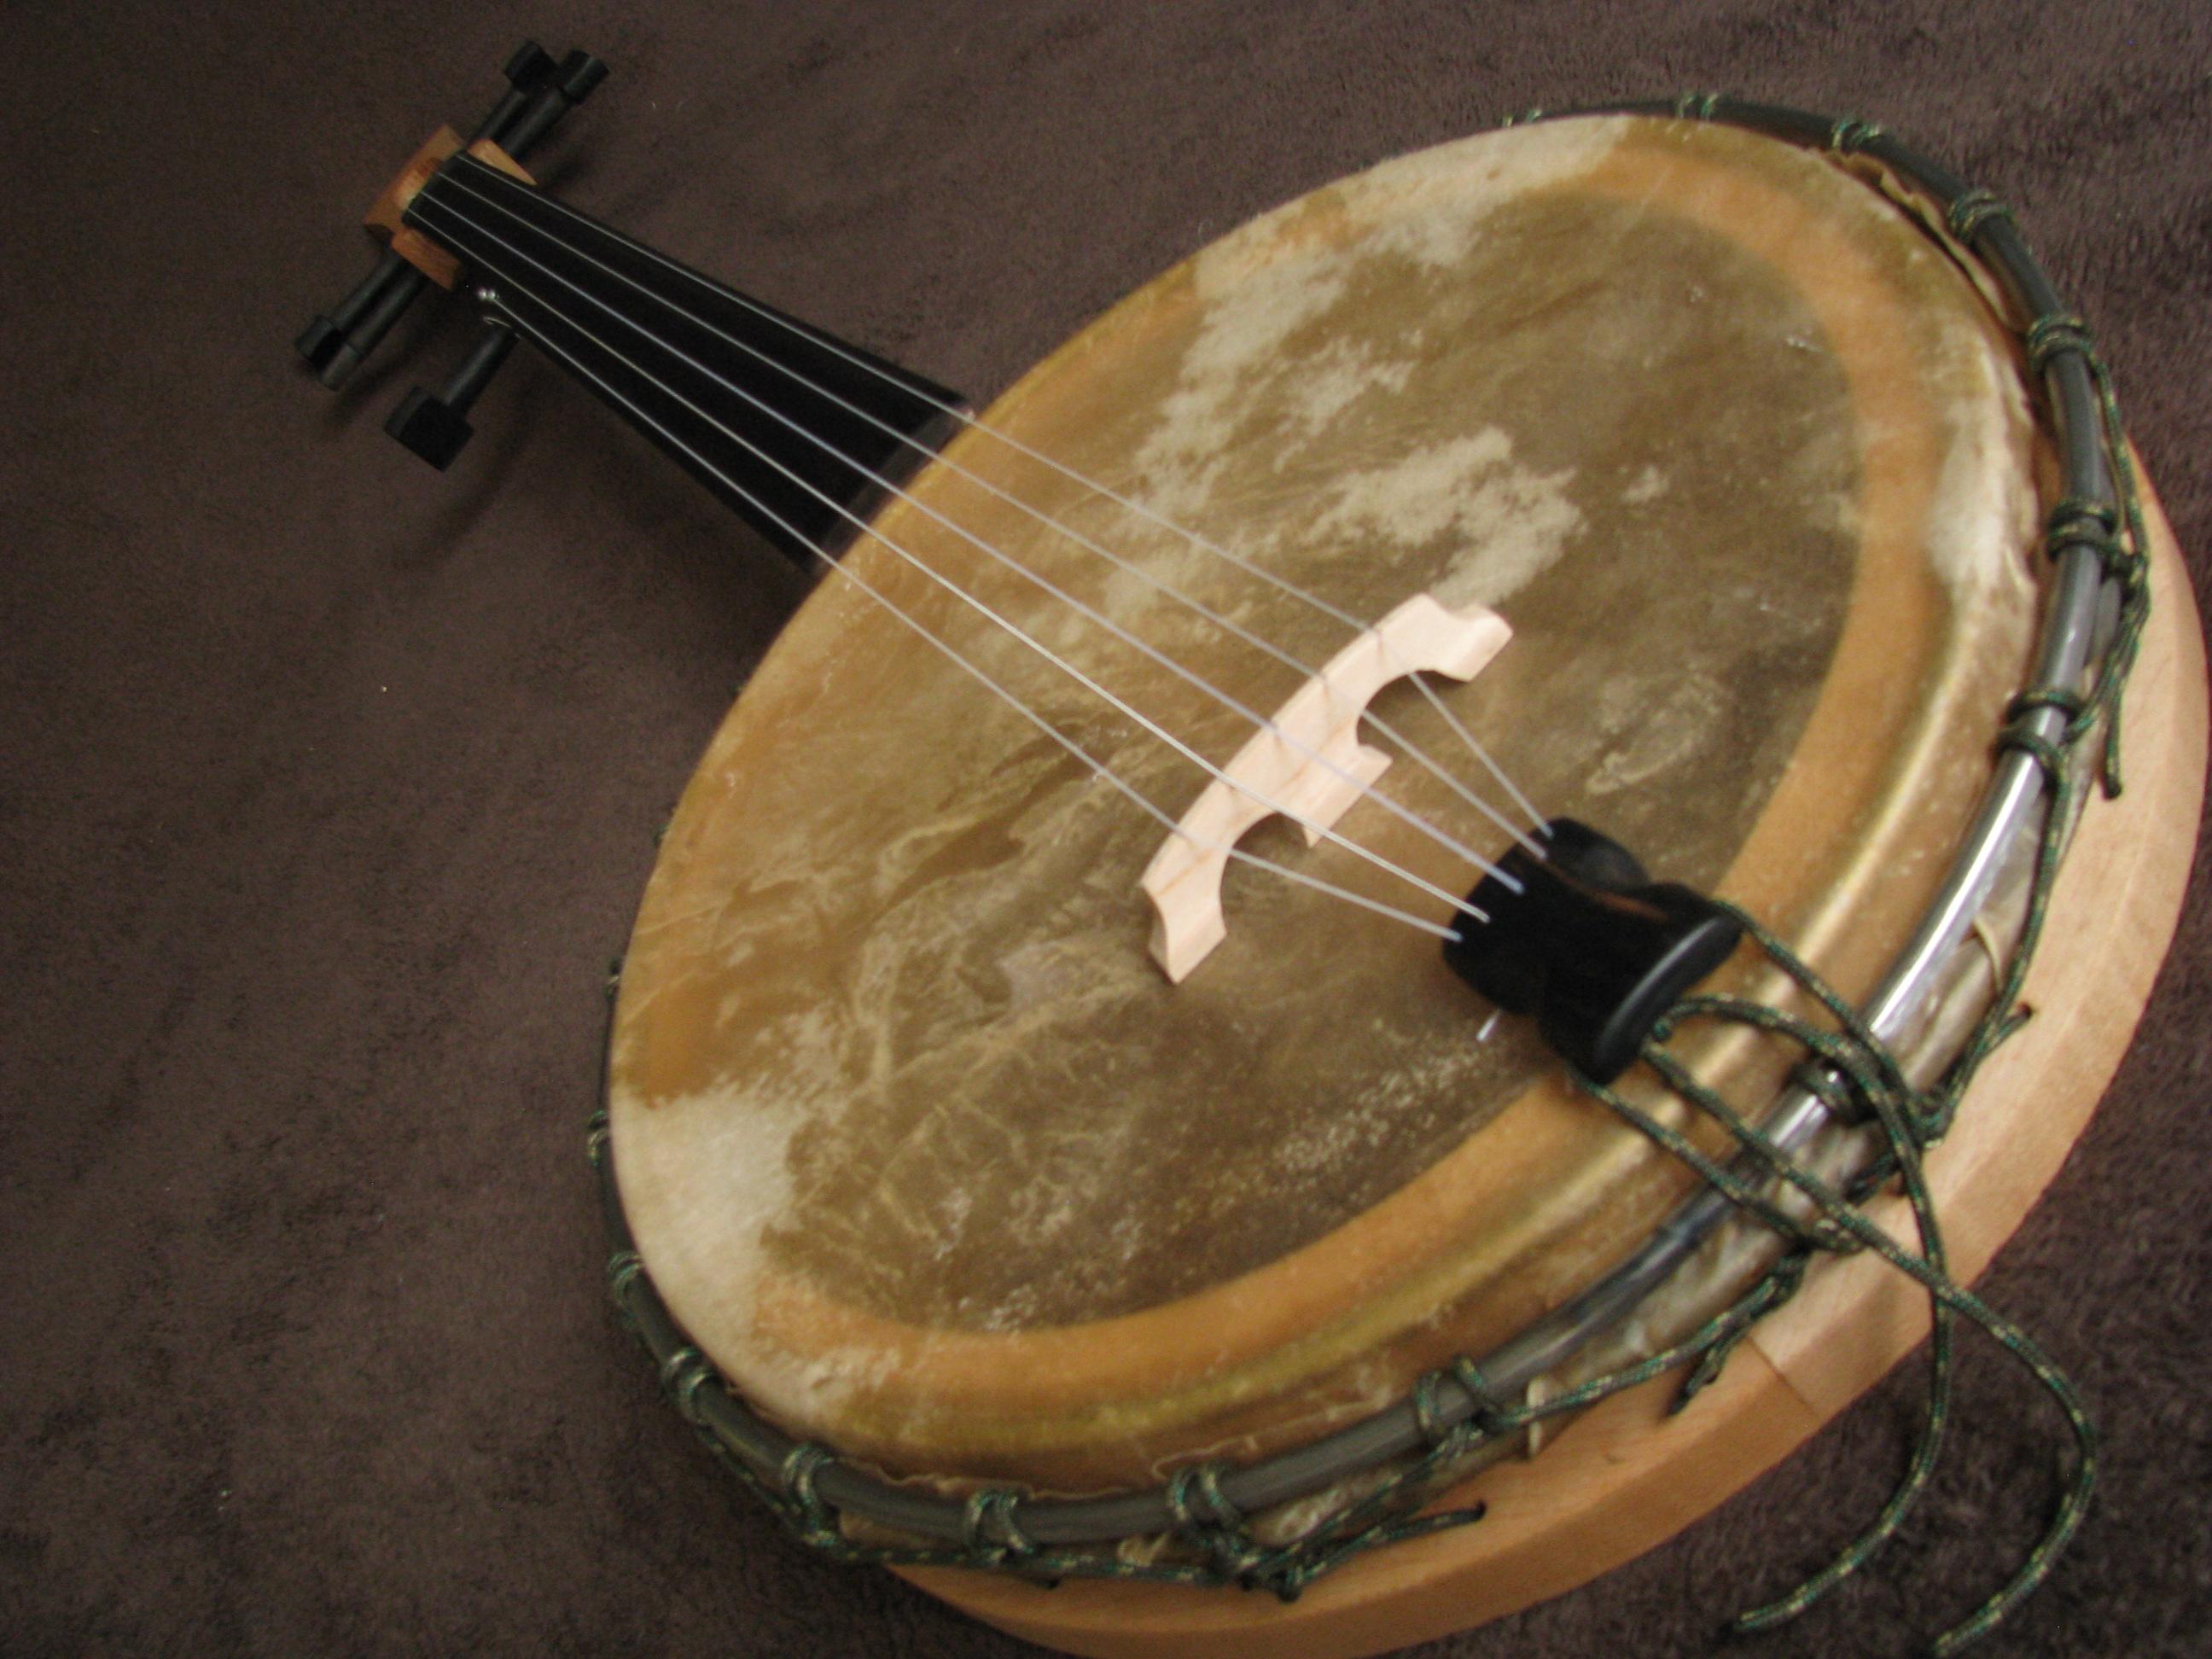 Banjo, no manufactured parts